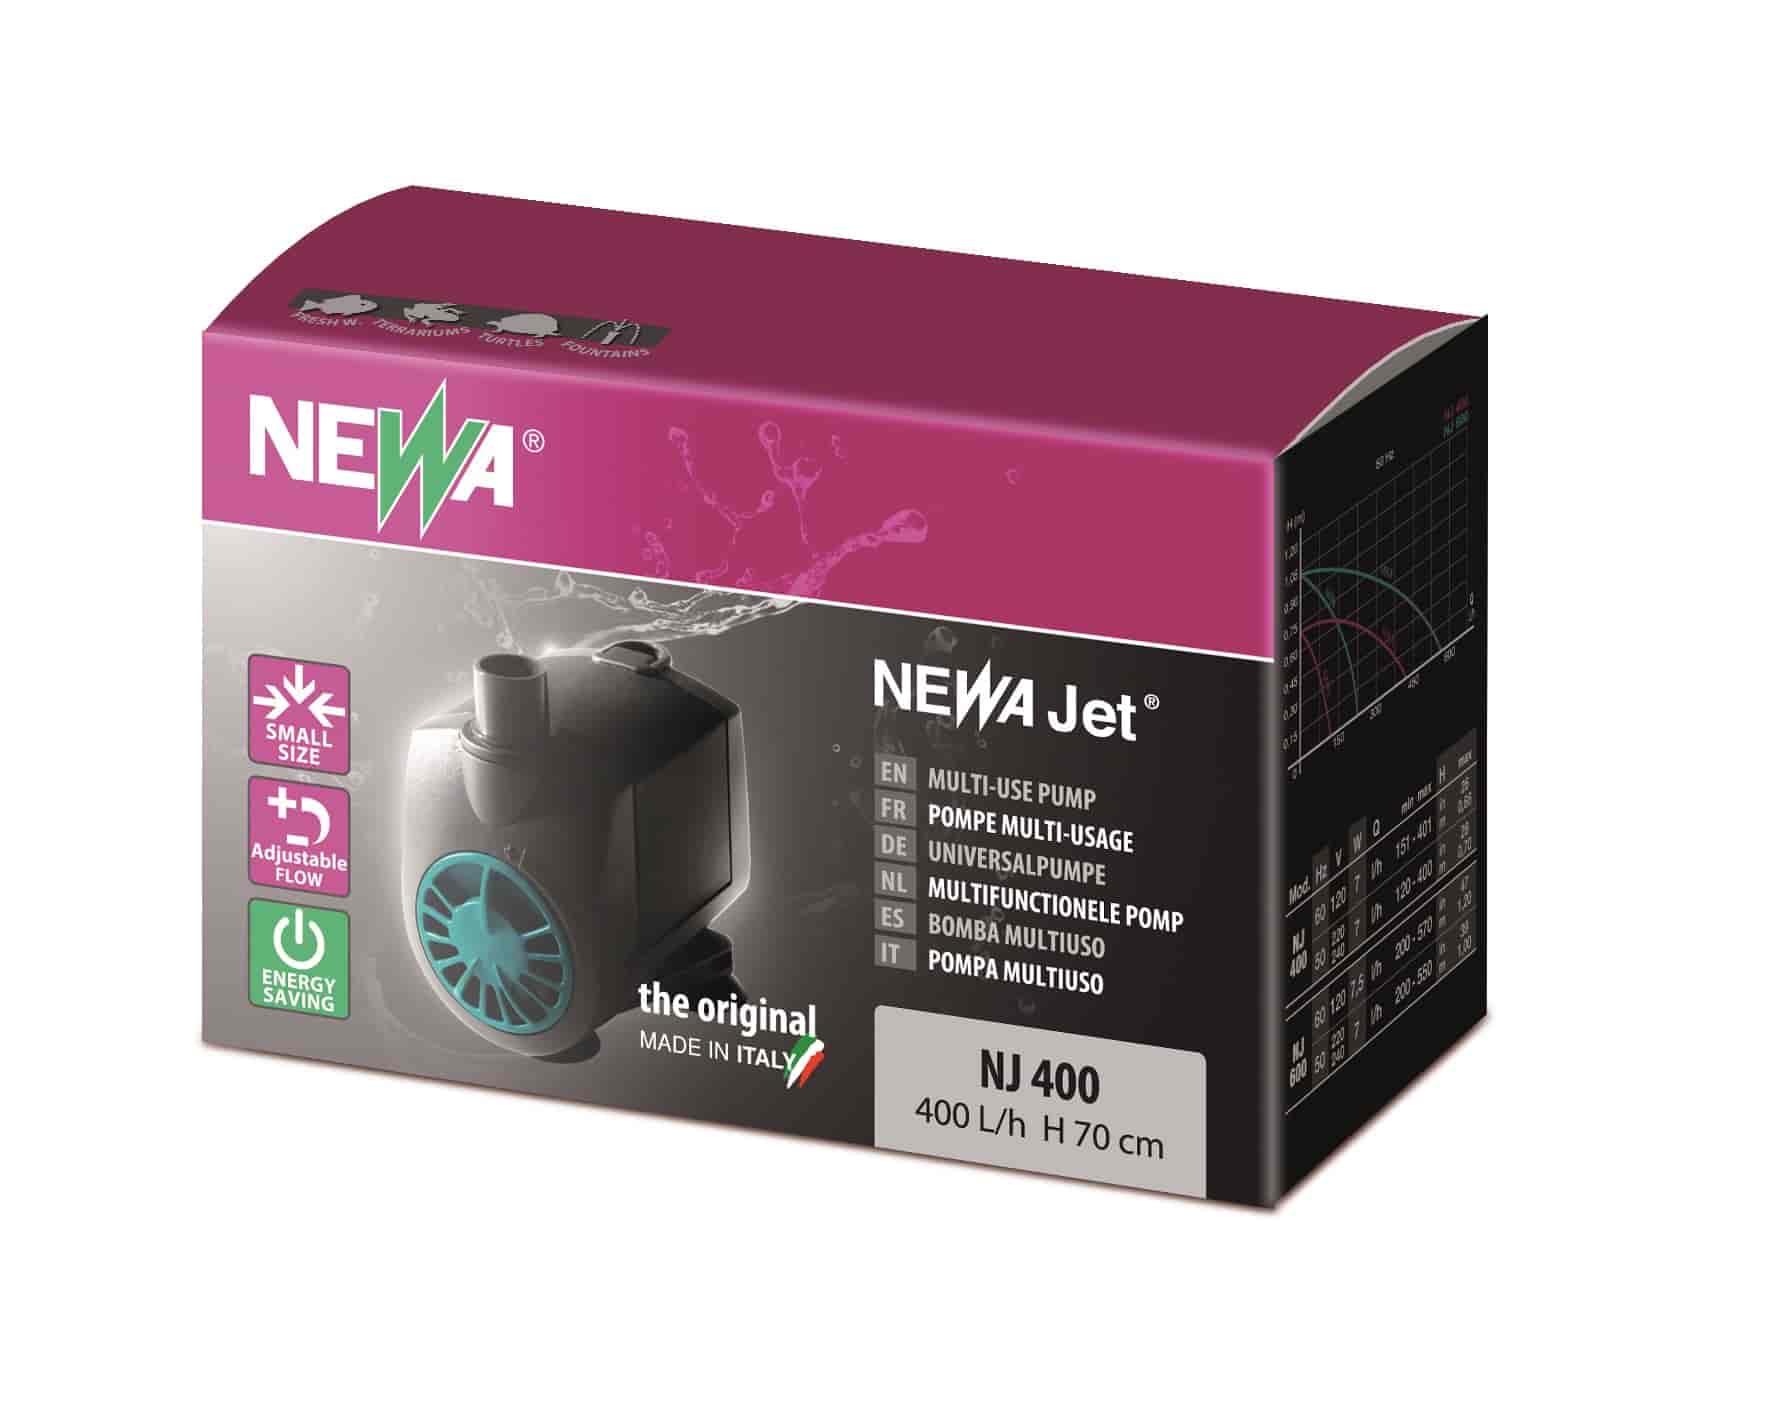 pompe-aquarium-newa-NJ-400-newjet-min